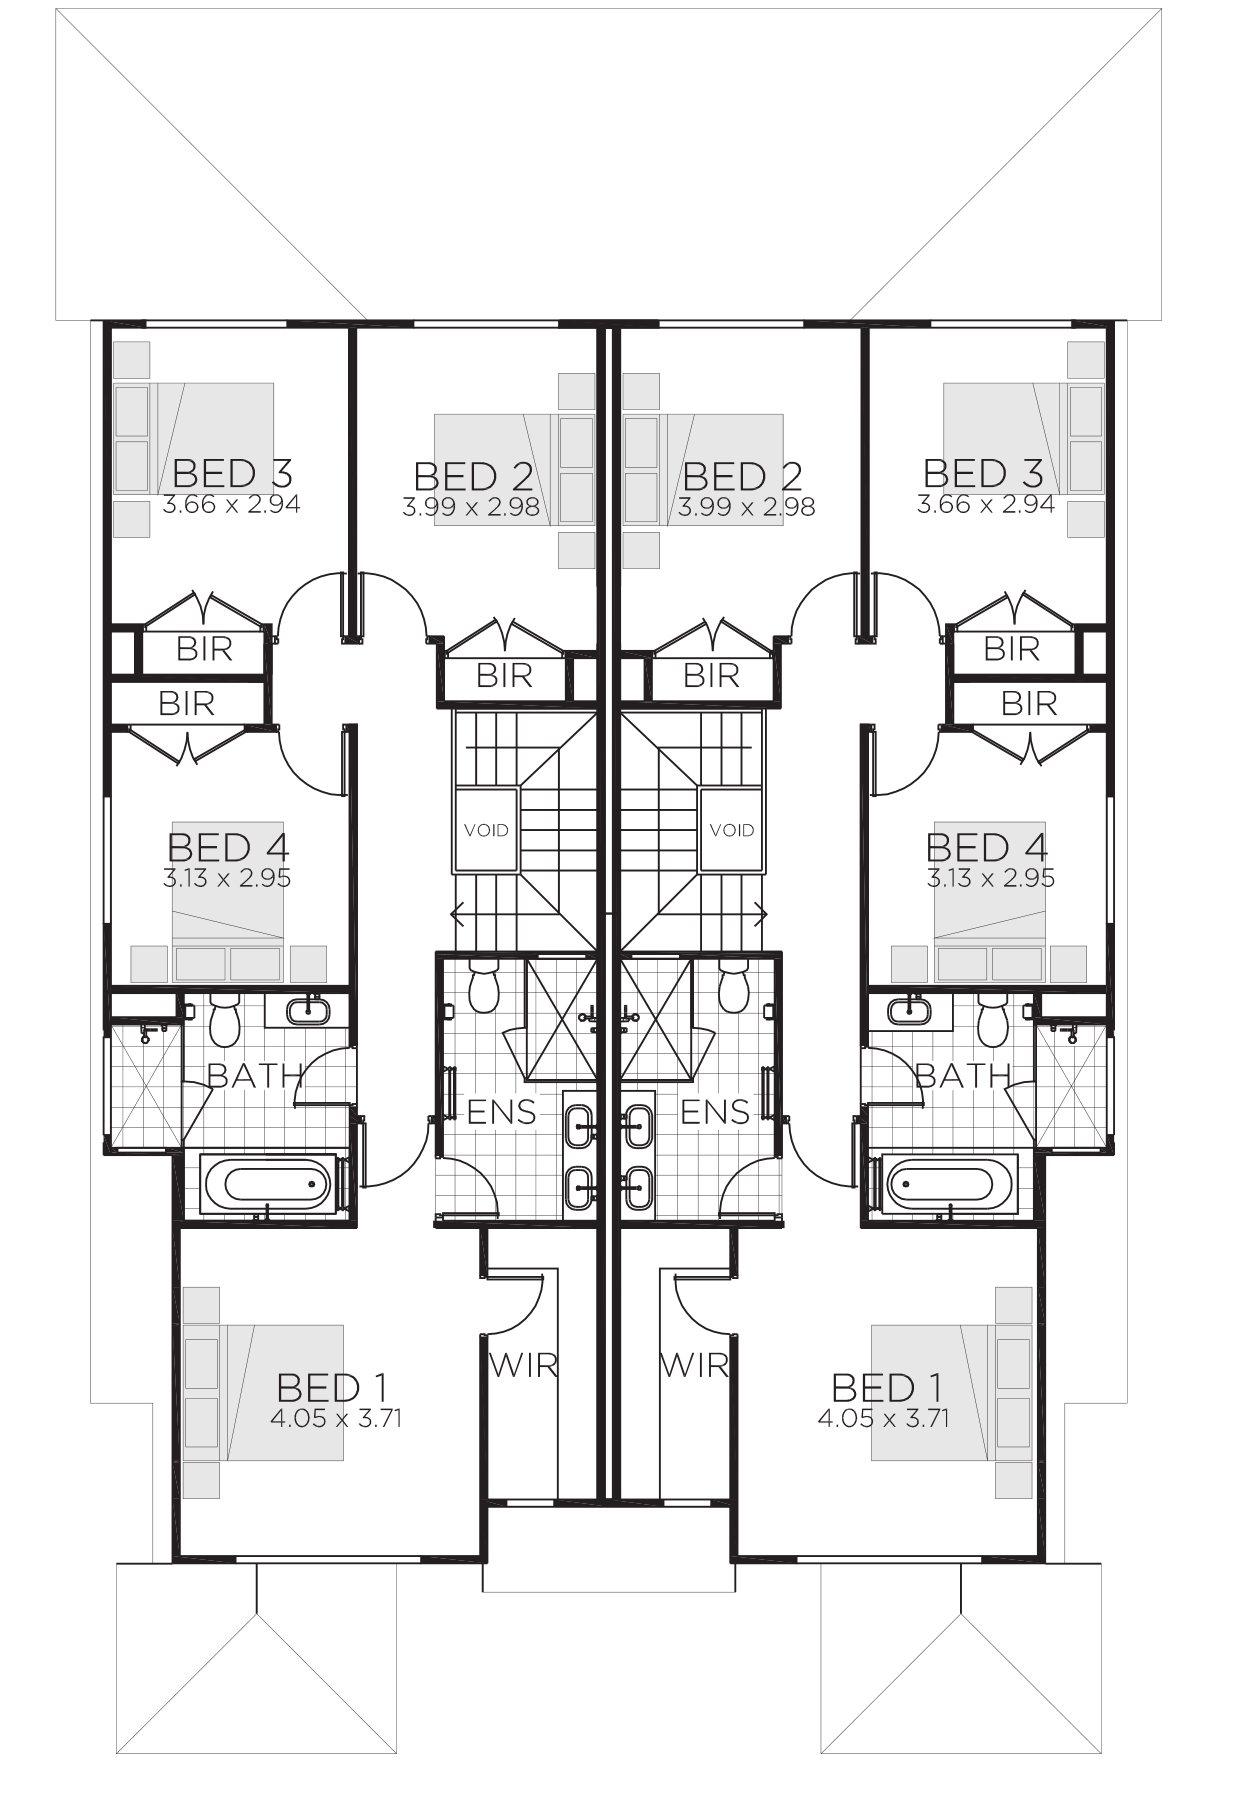 2 Storey Duplex House Plans